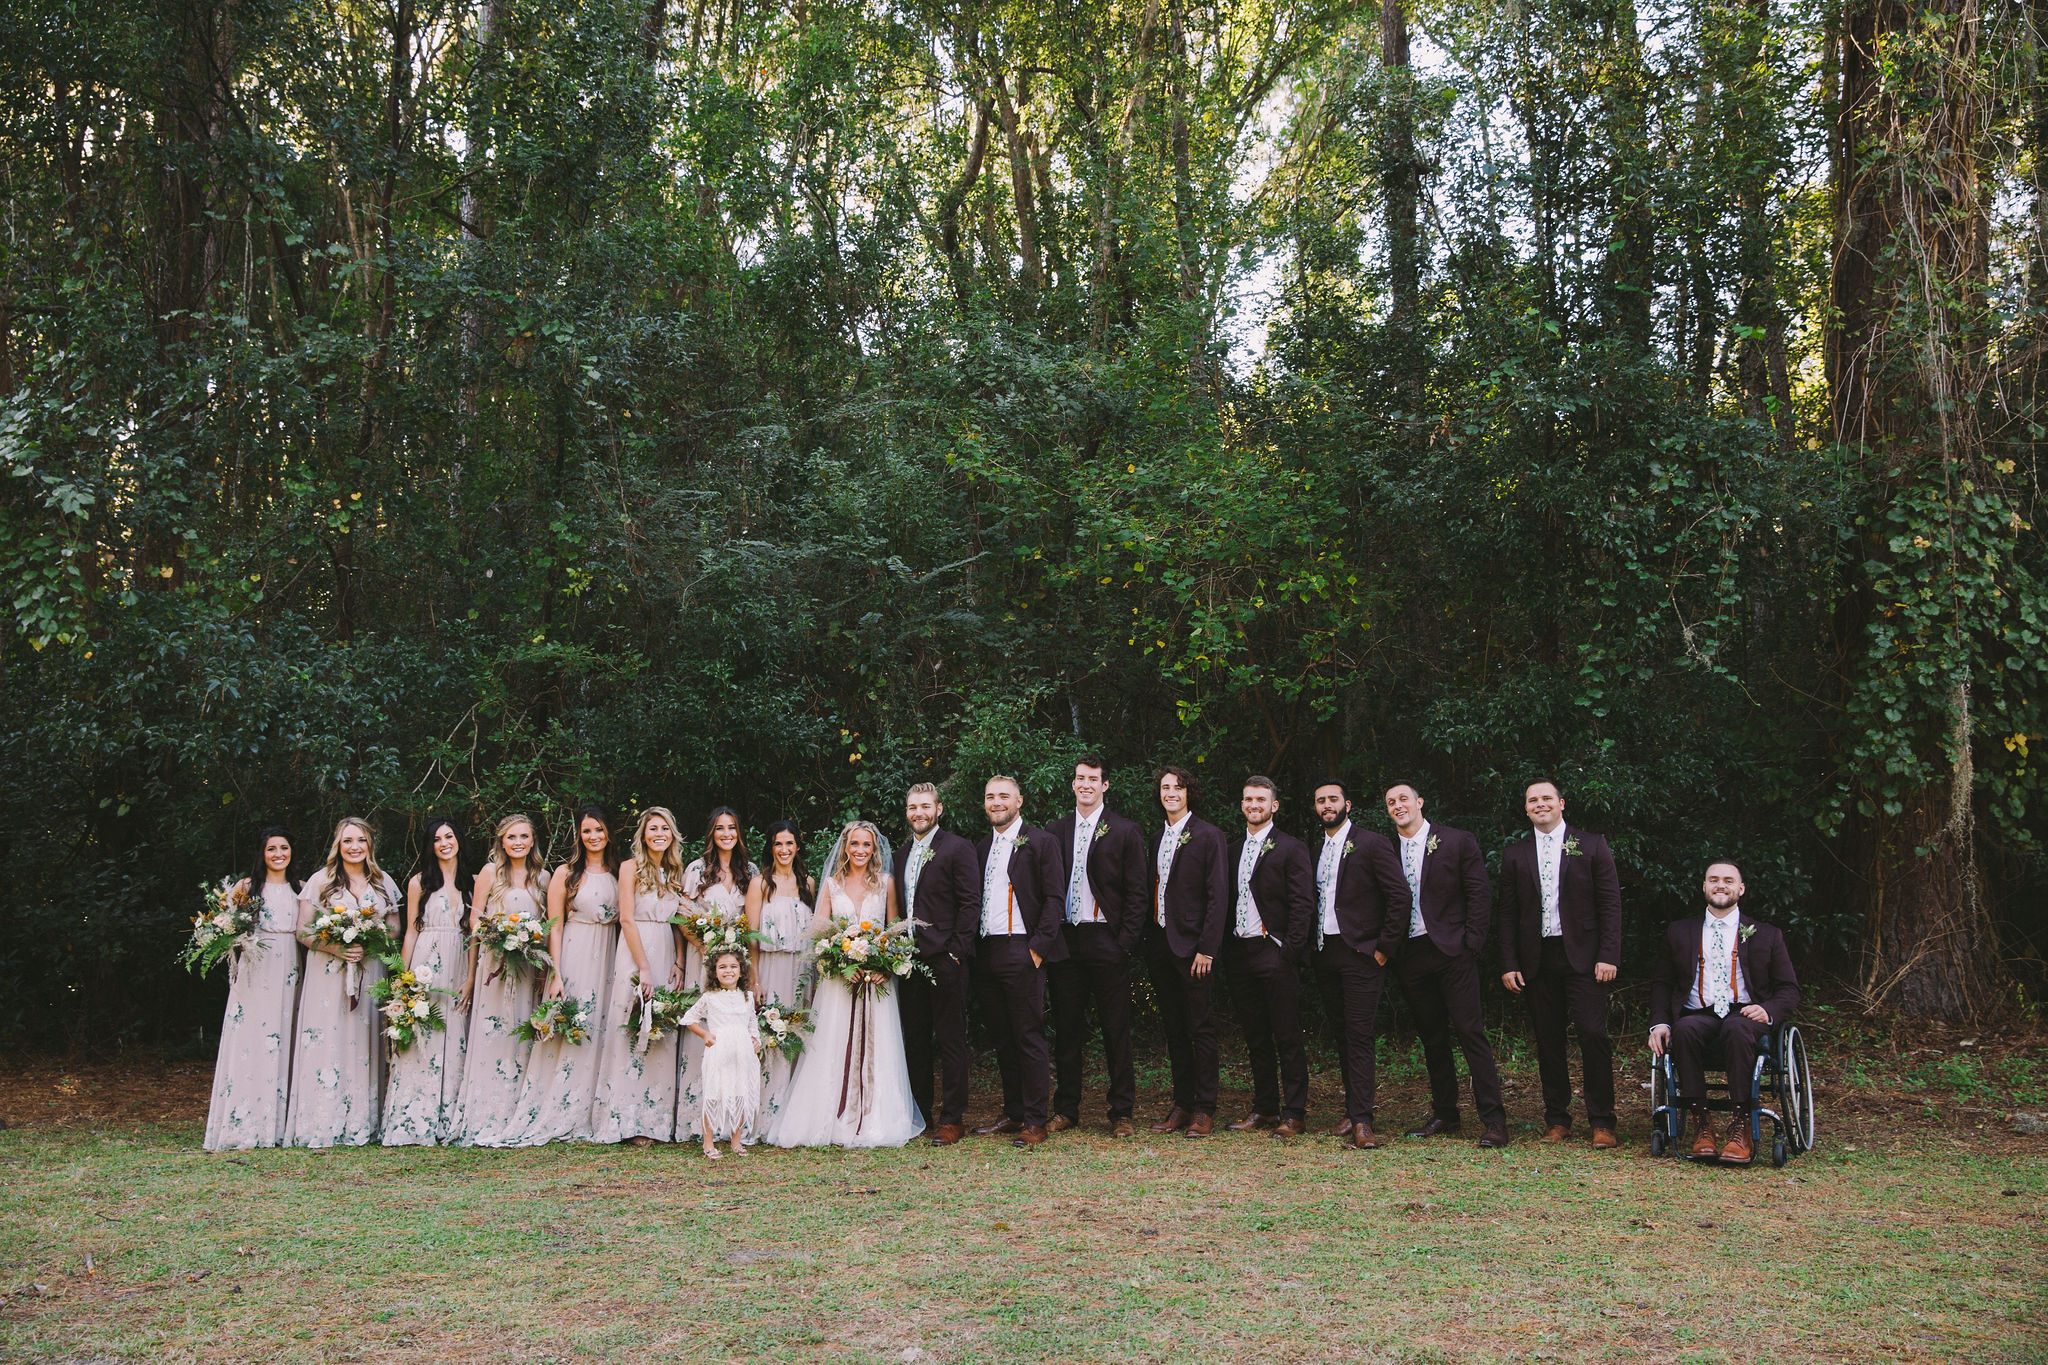 Jesseandlex_181103_AlexisNate_Wedding_BridalParty_008.jpg